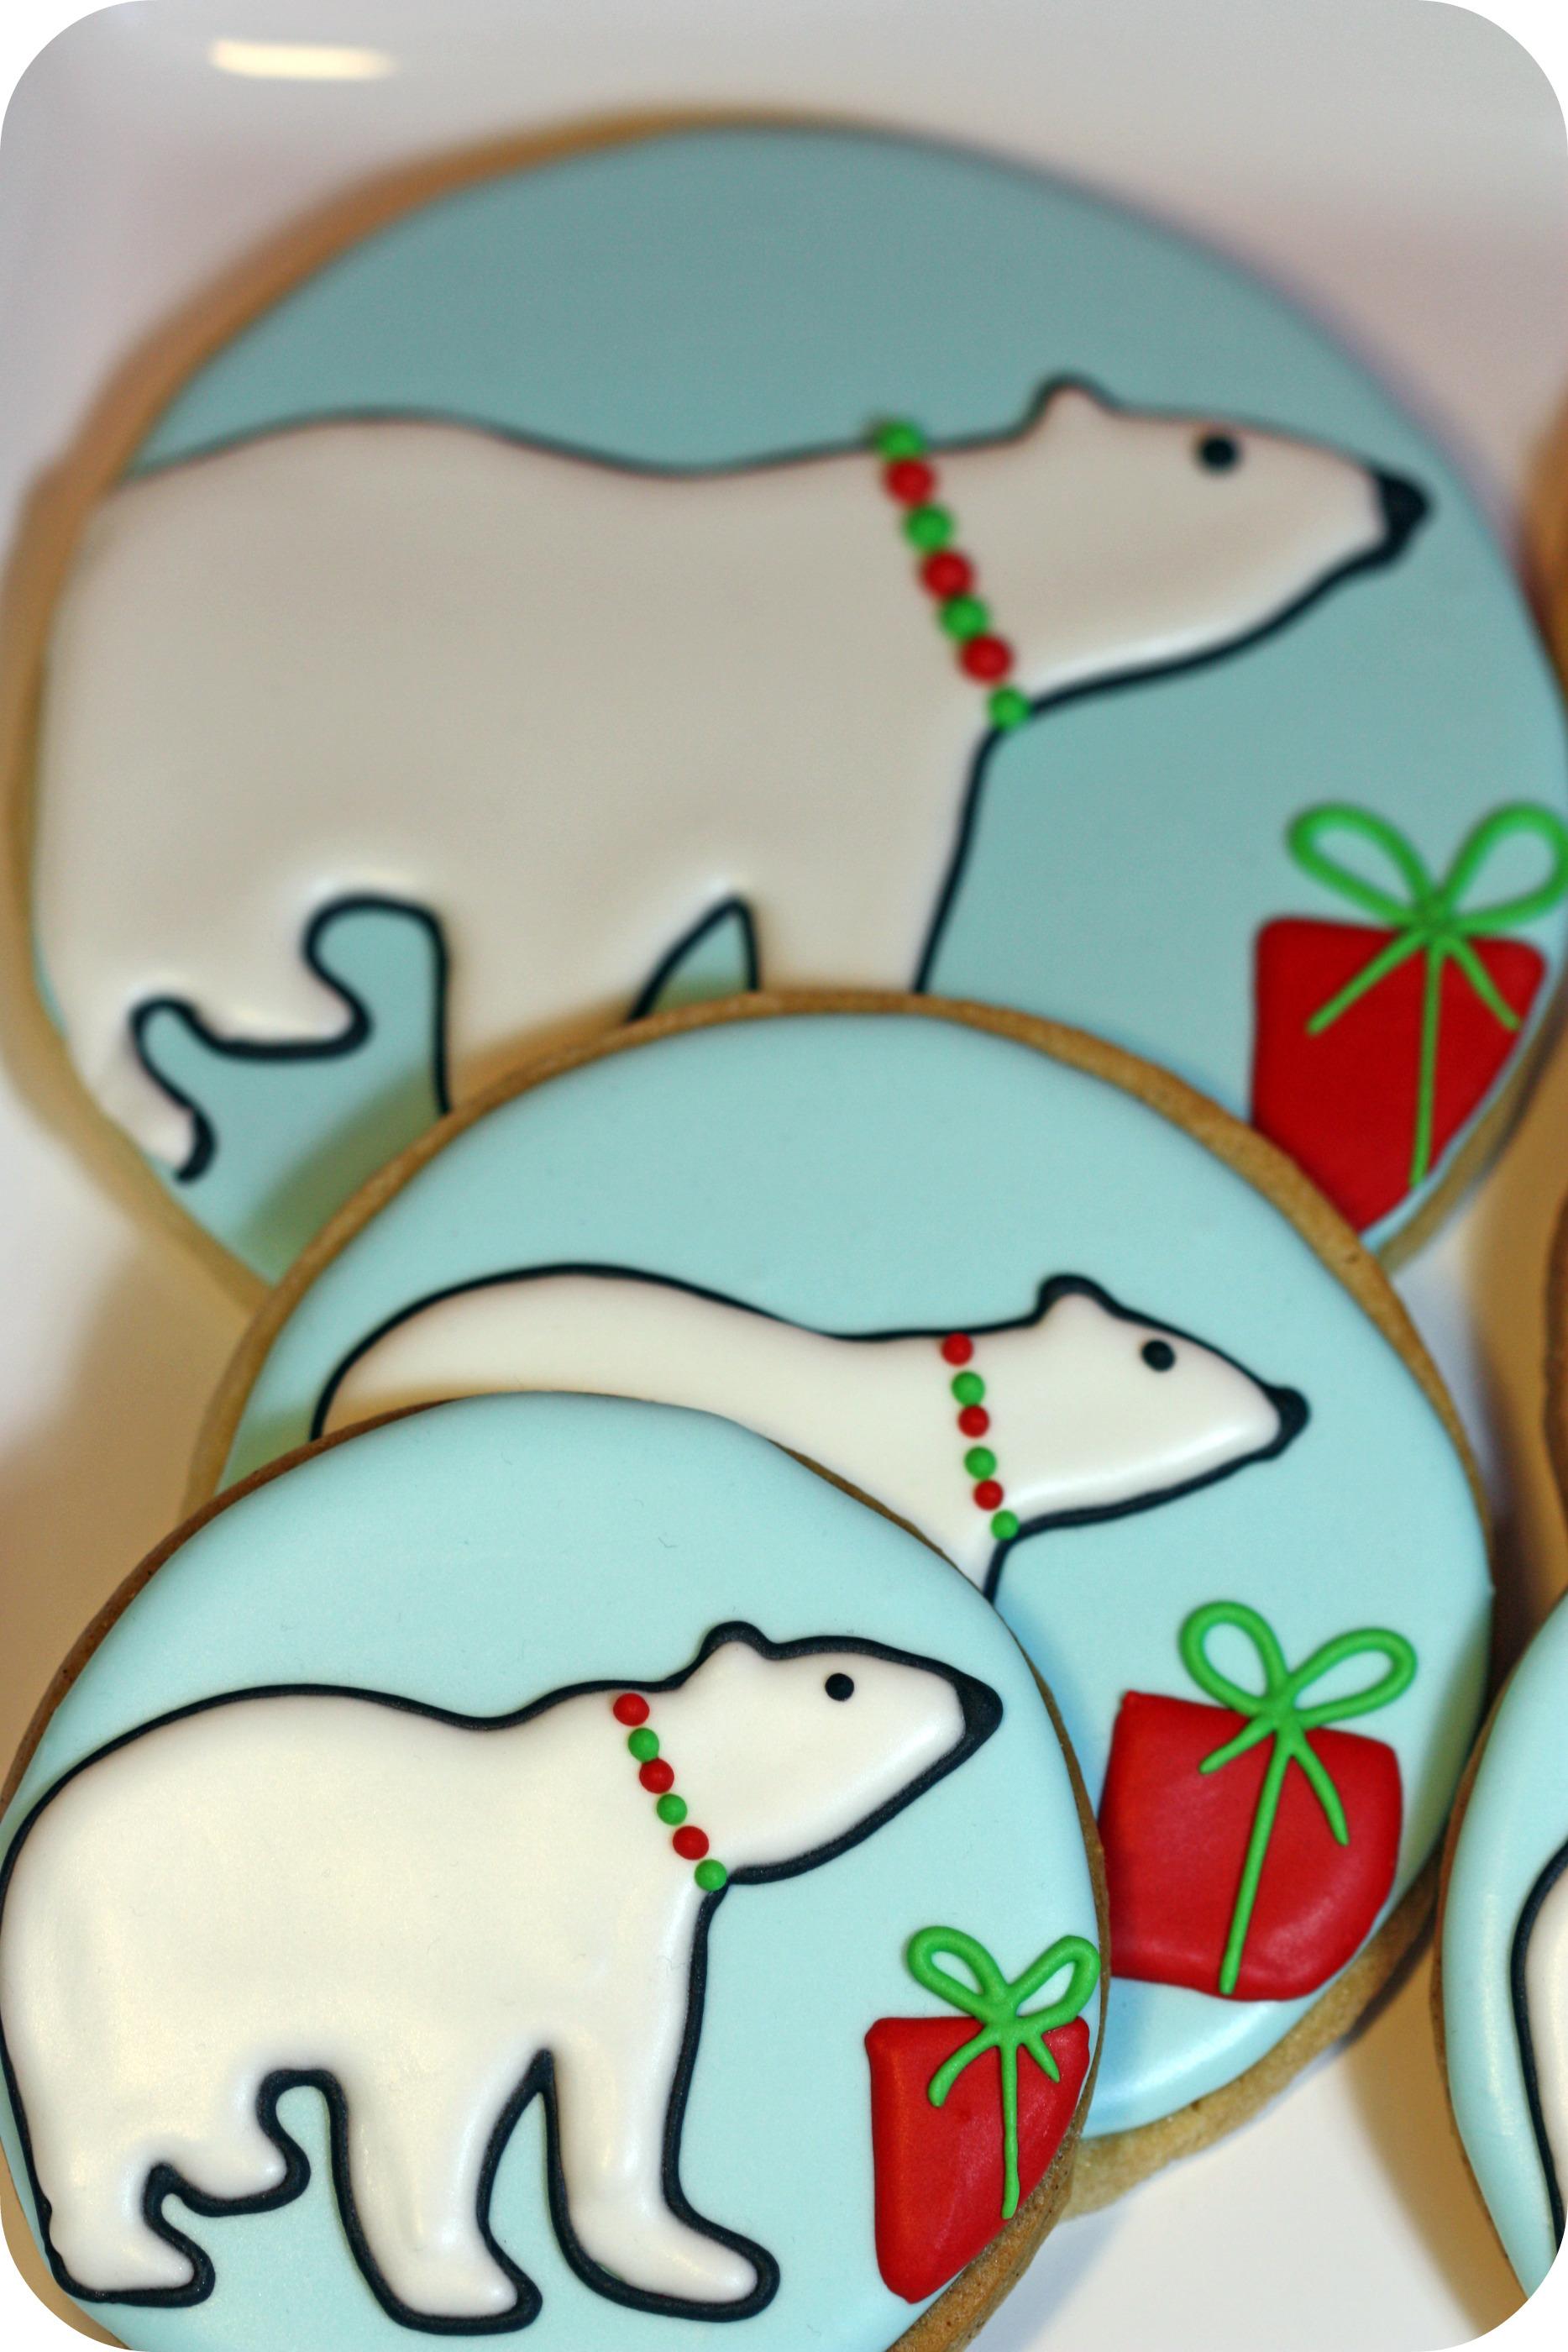 Sugar Cookie Recipe | Tasty Kitchen: A Happy Recipe Community!